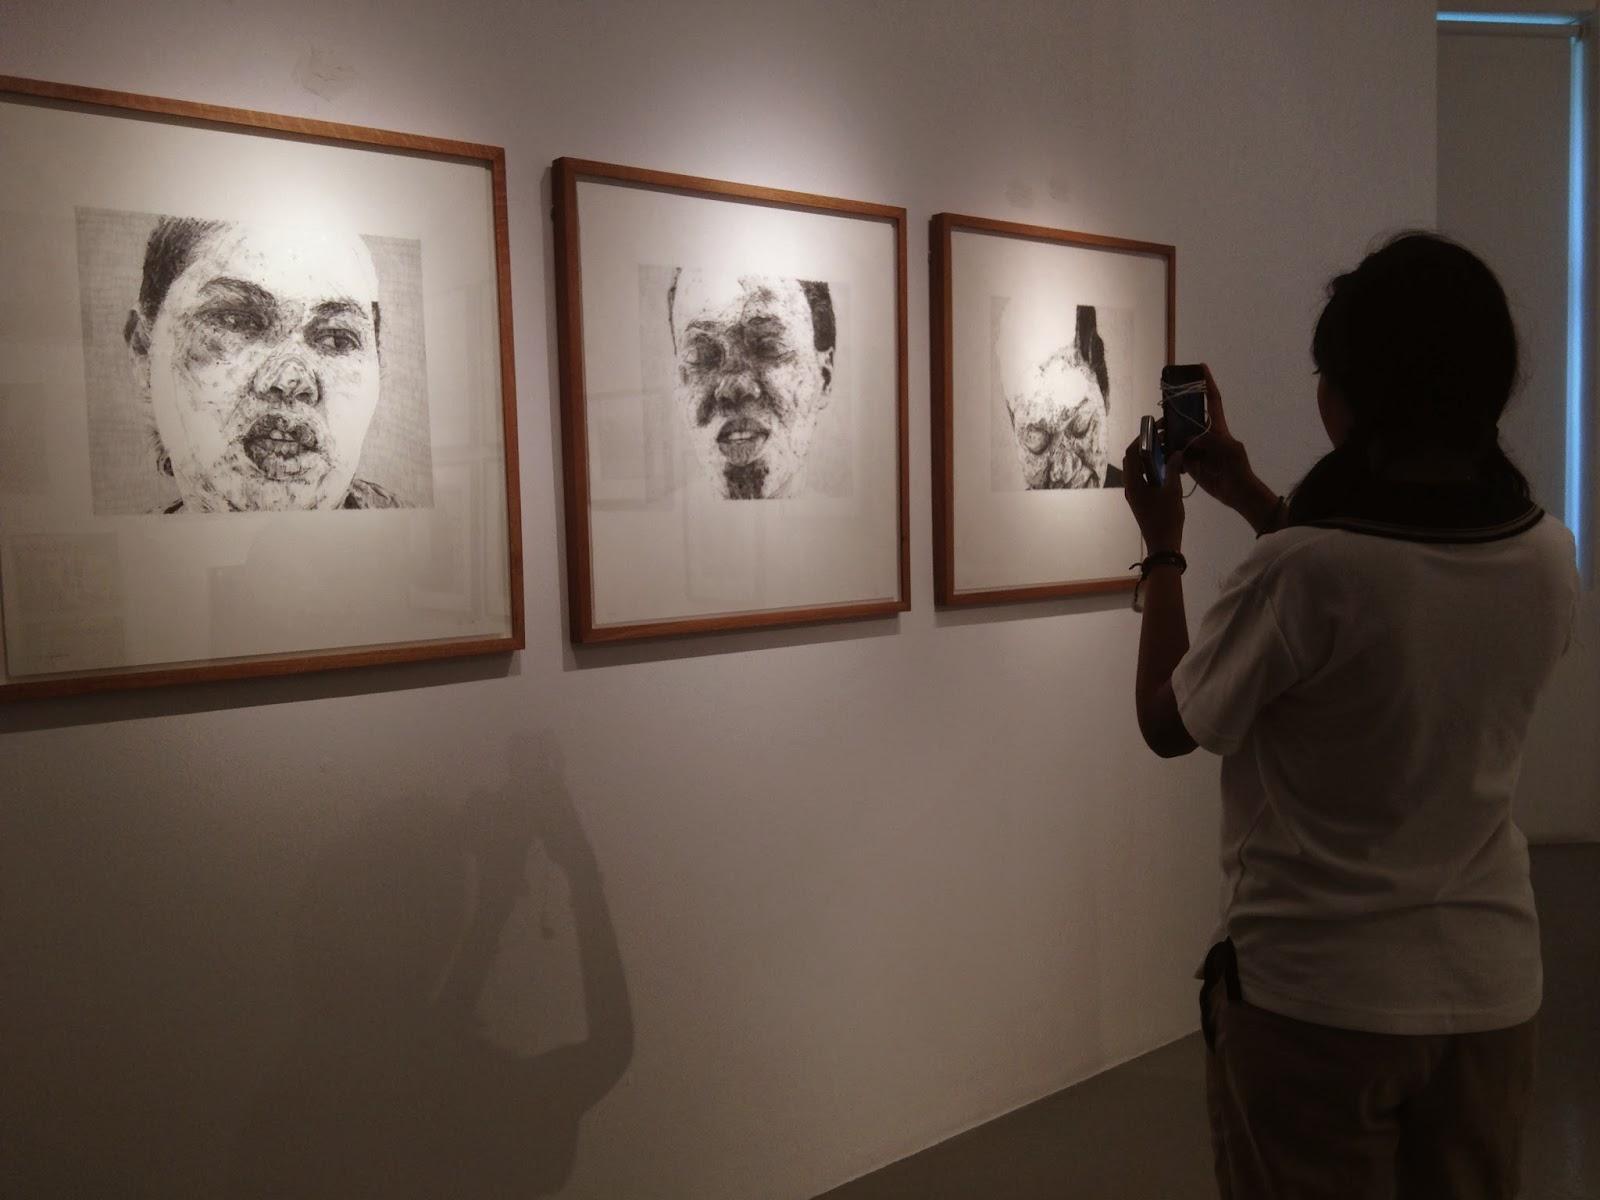 gabriel goliath's faces of war goodman gallery johannesburg